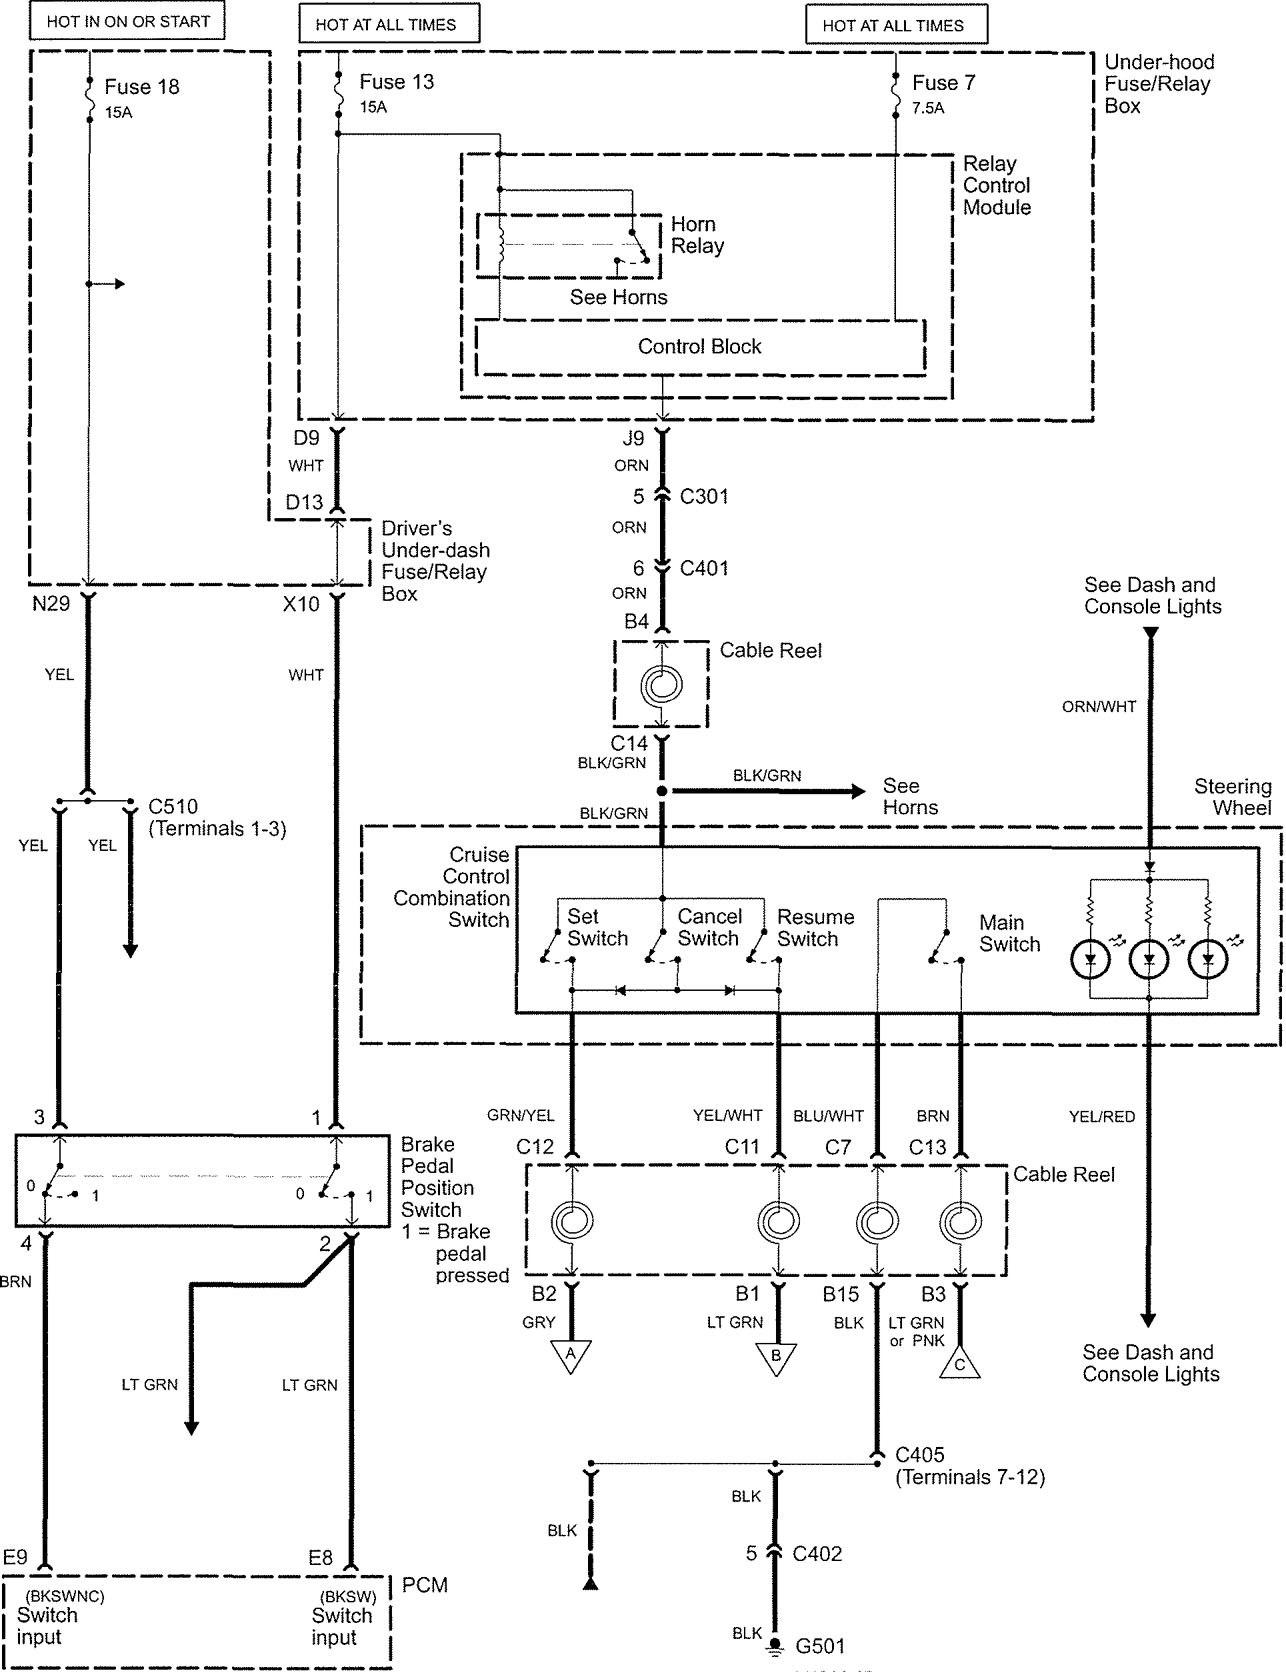 05 Acura Rl Wiring Diagram Wiring Diagram Services \u2022 Future Acura RL  2014 2005 Acura Rl Wiring Diagram